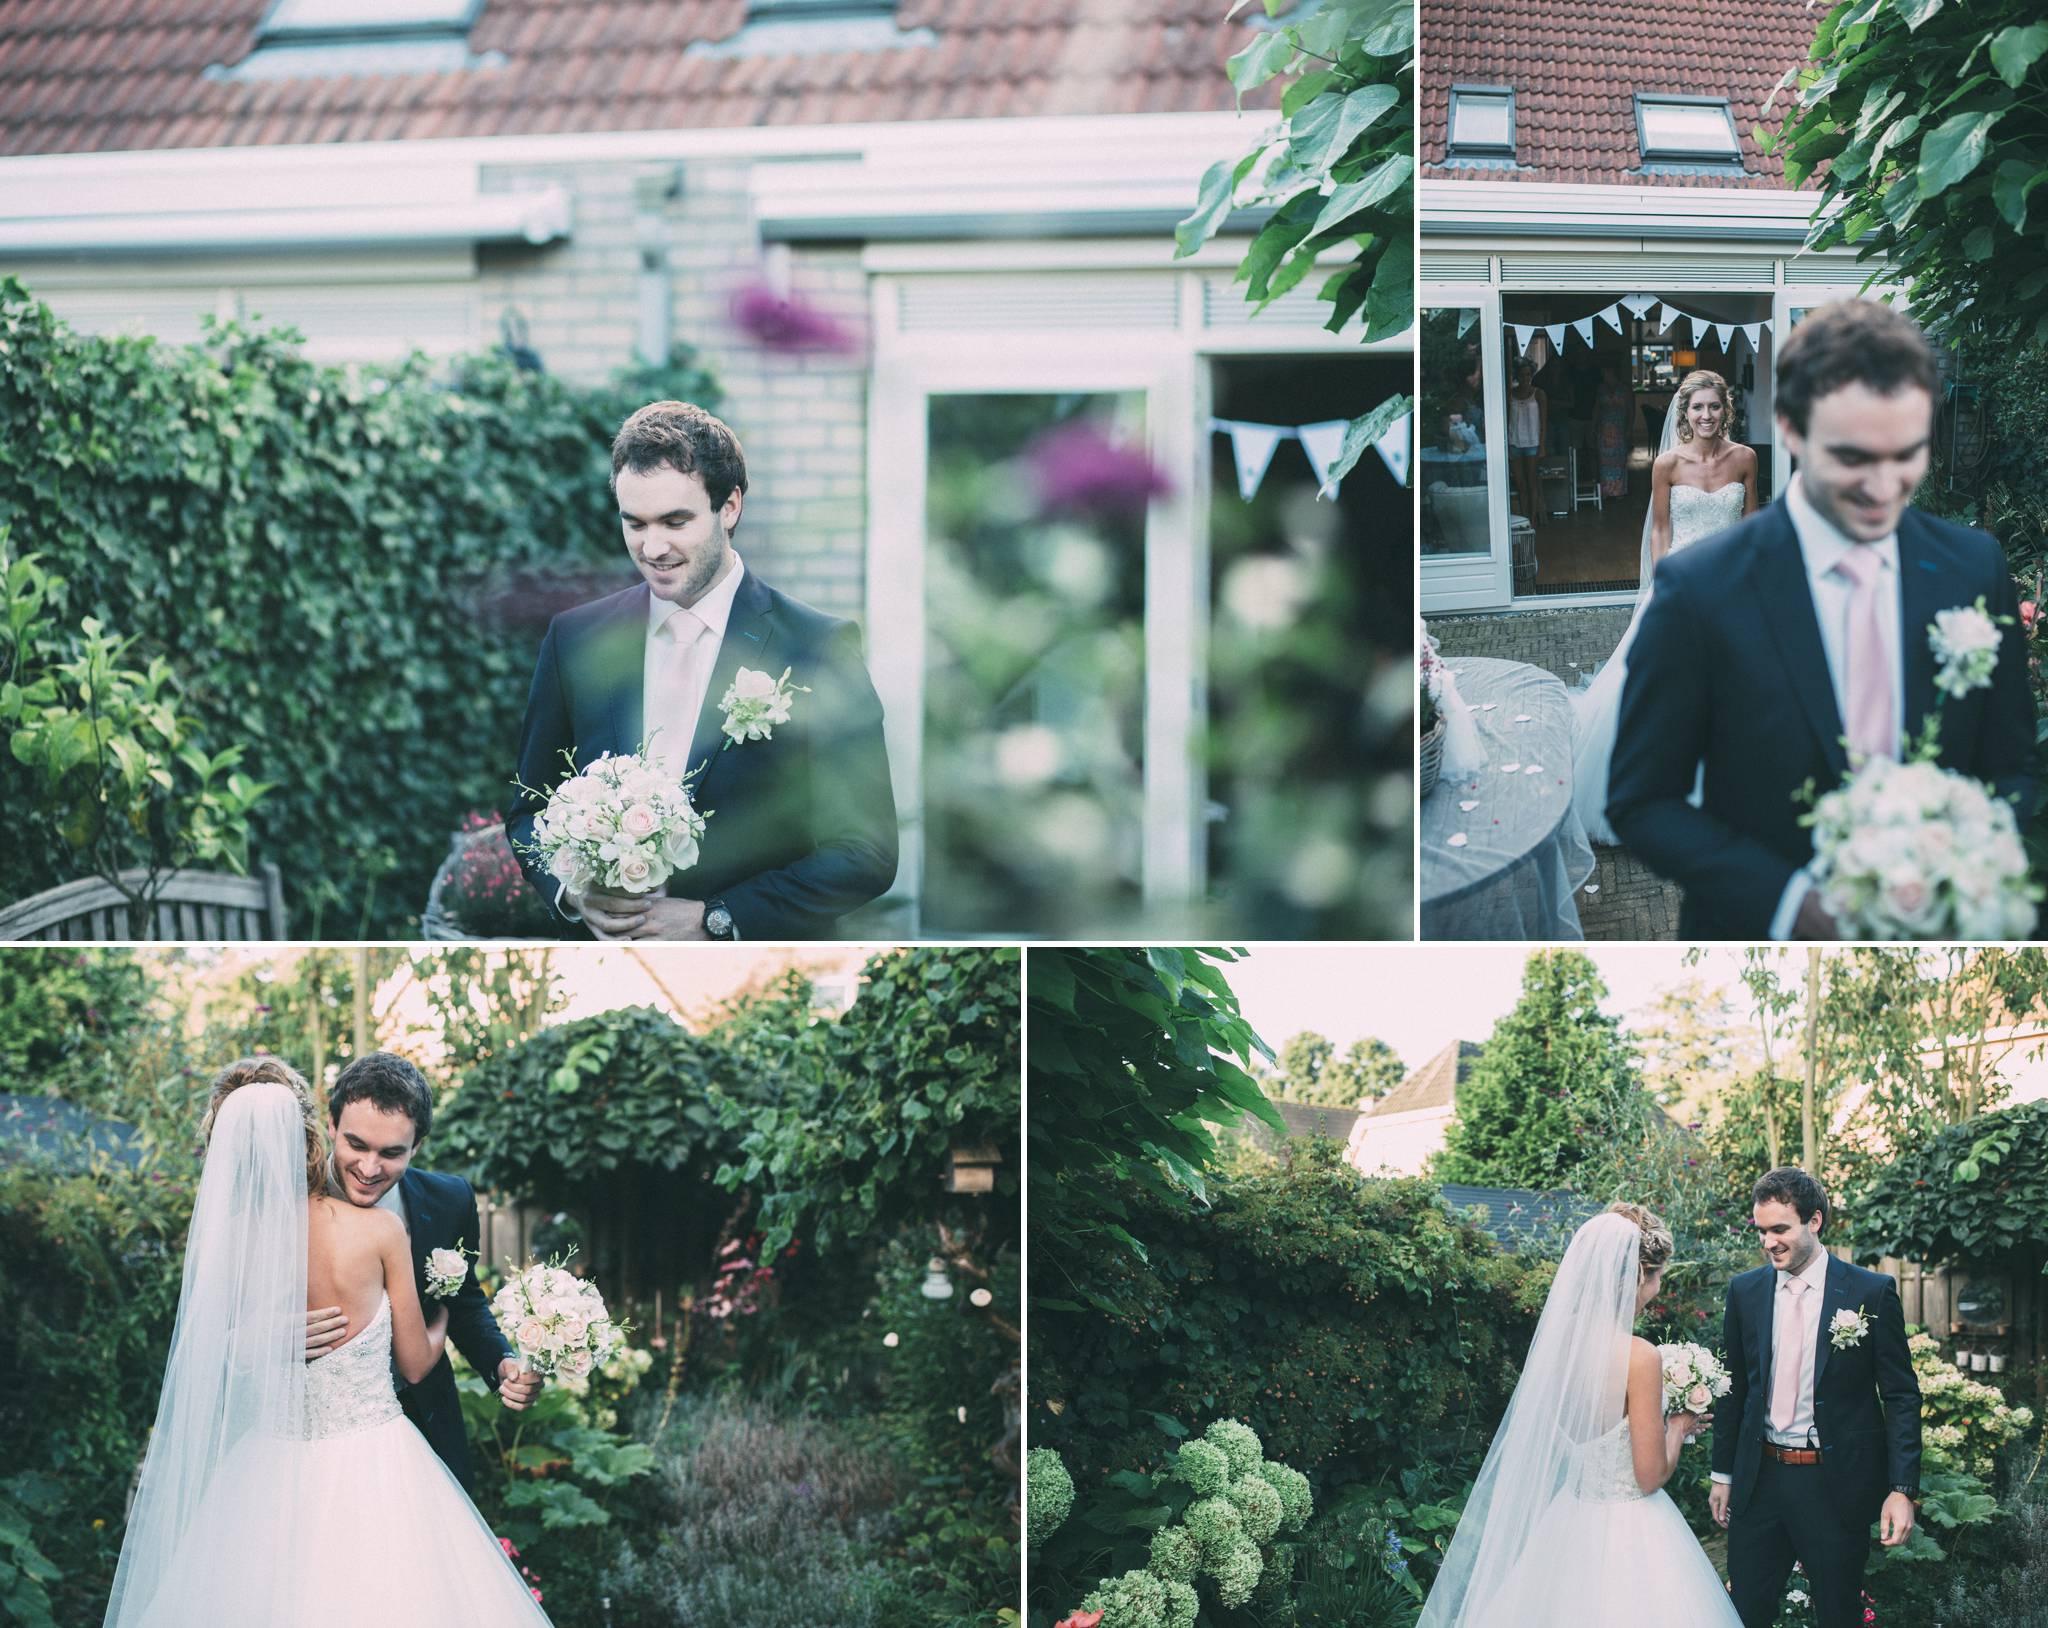 Bruidsfotograaf Hardinxveld-Giessendam